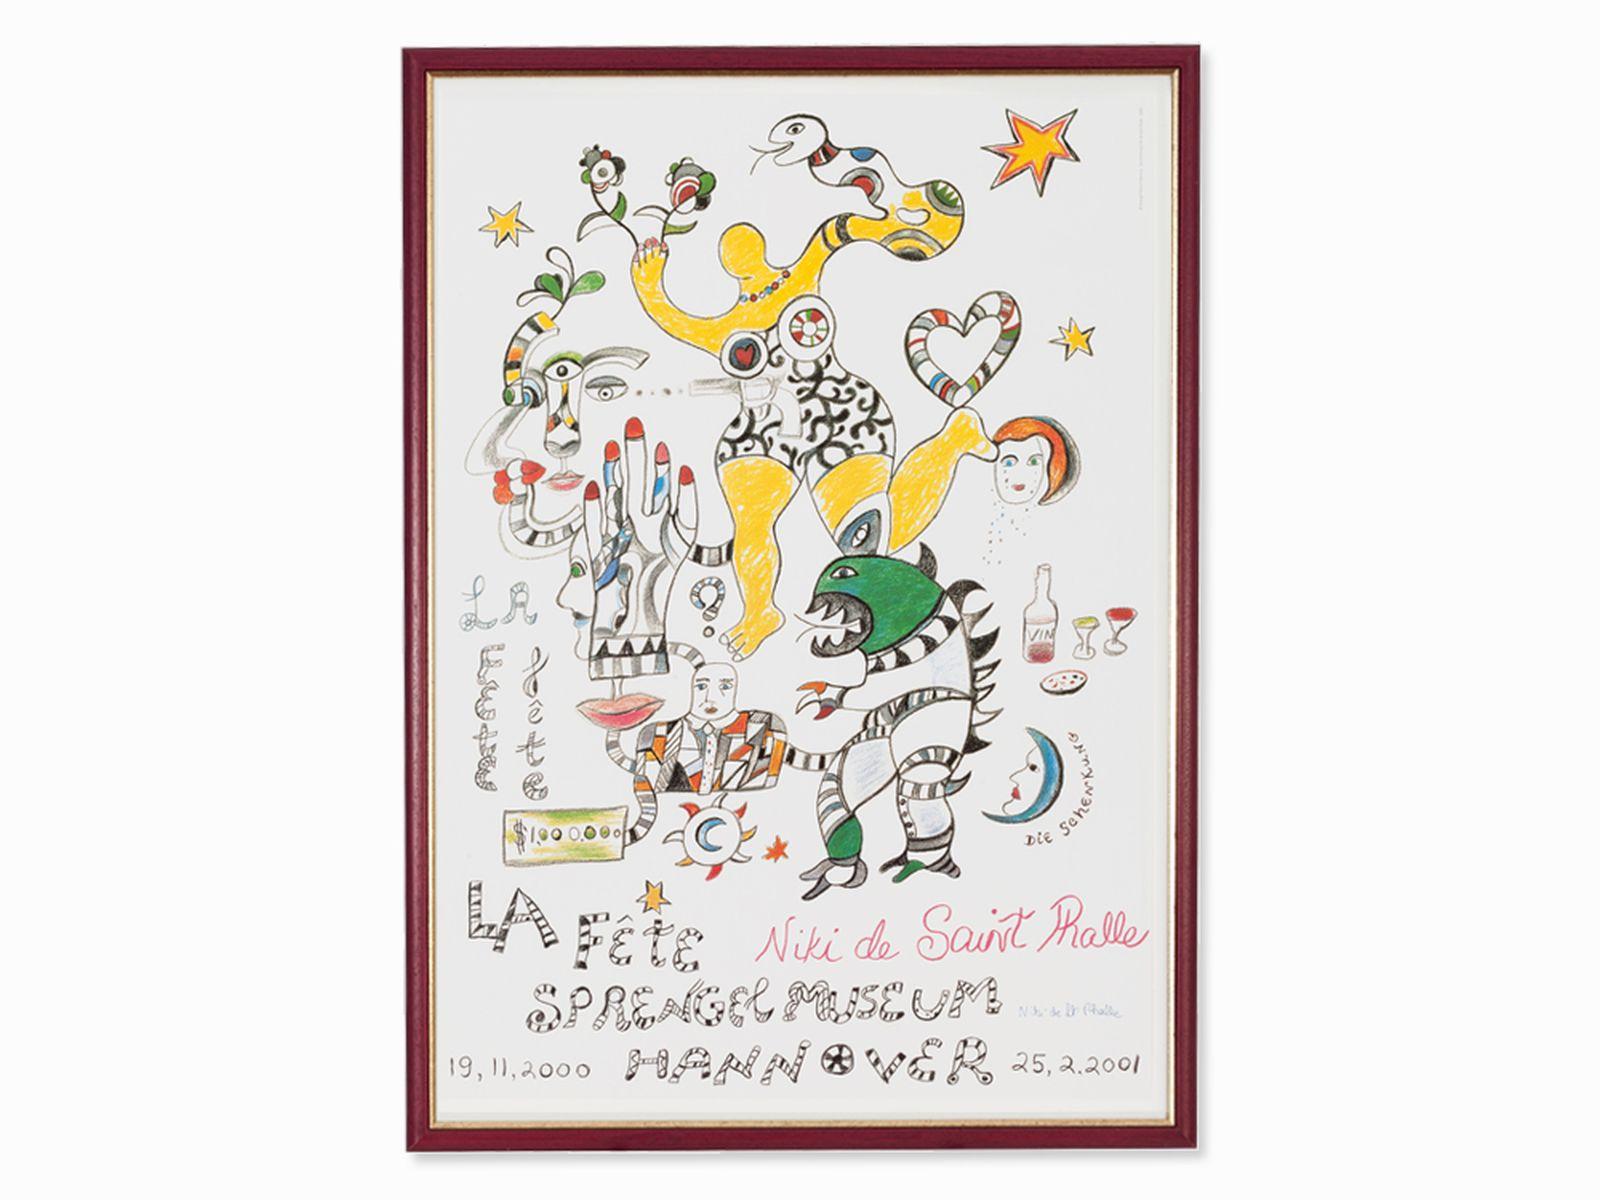 #137 Niki de Saint Phalle, poster Image